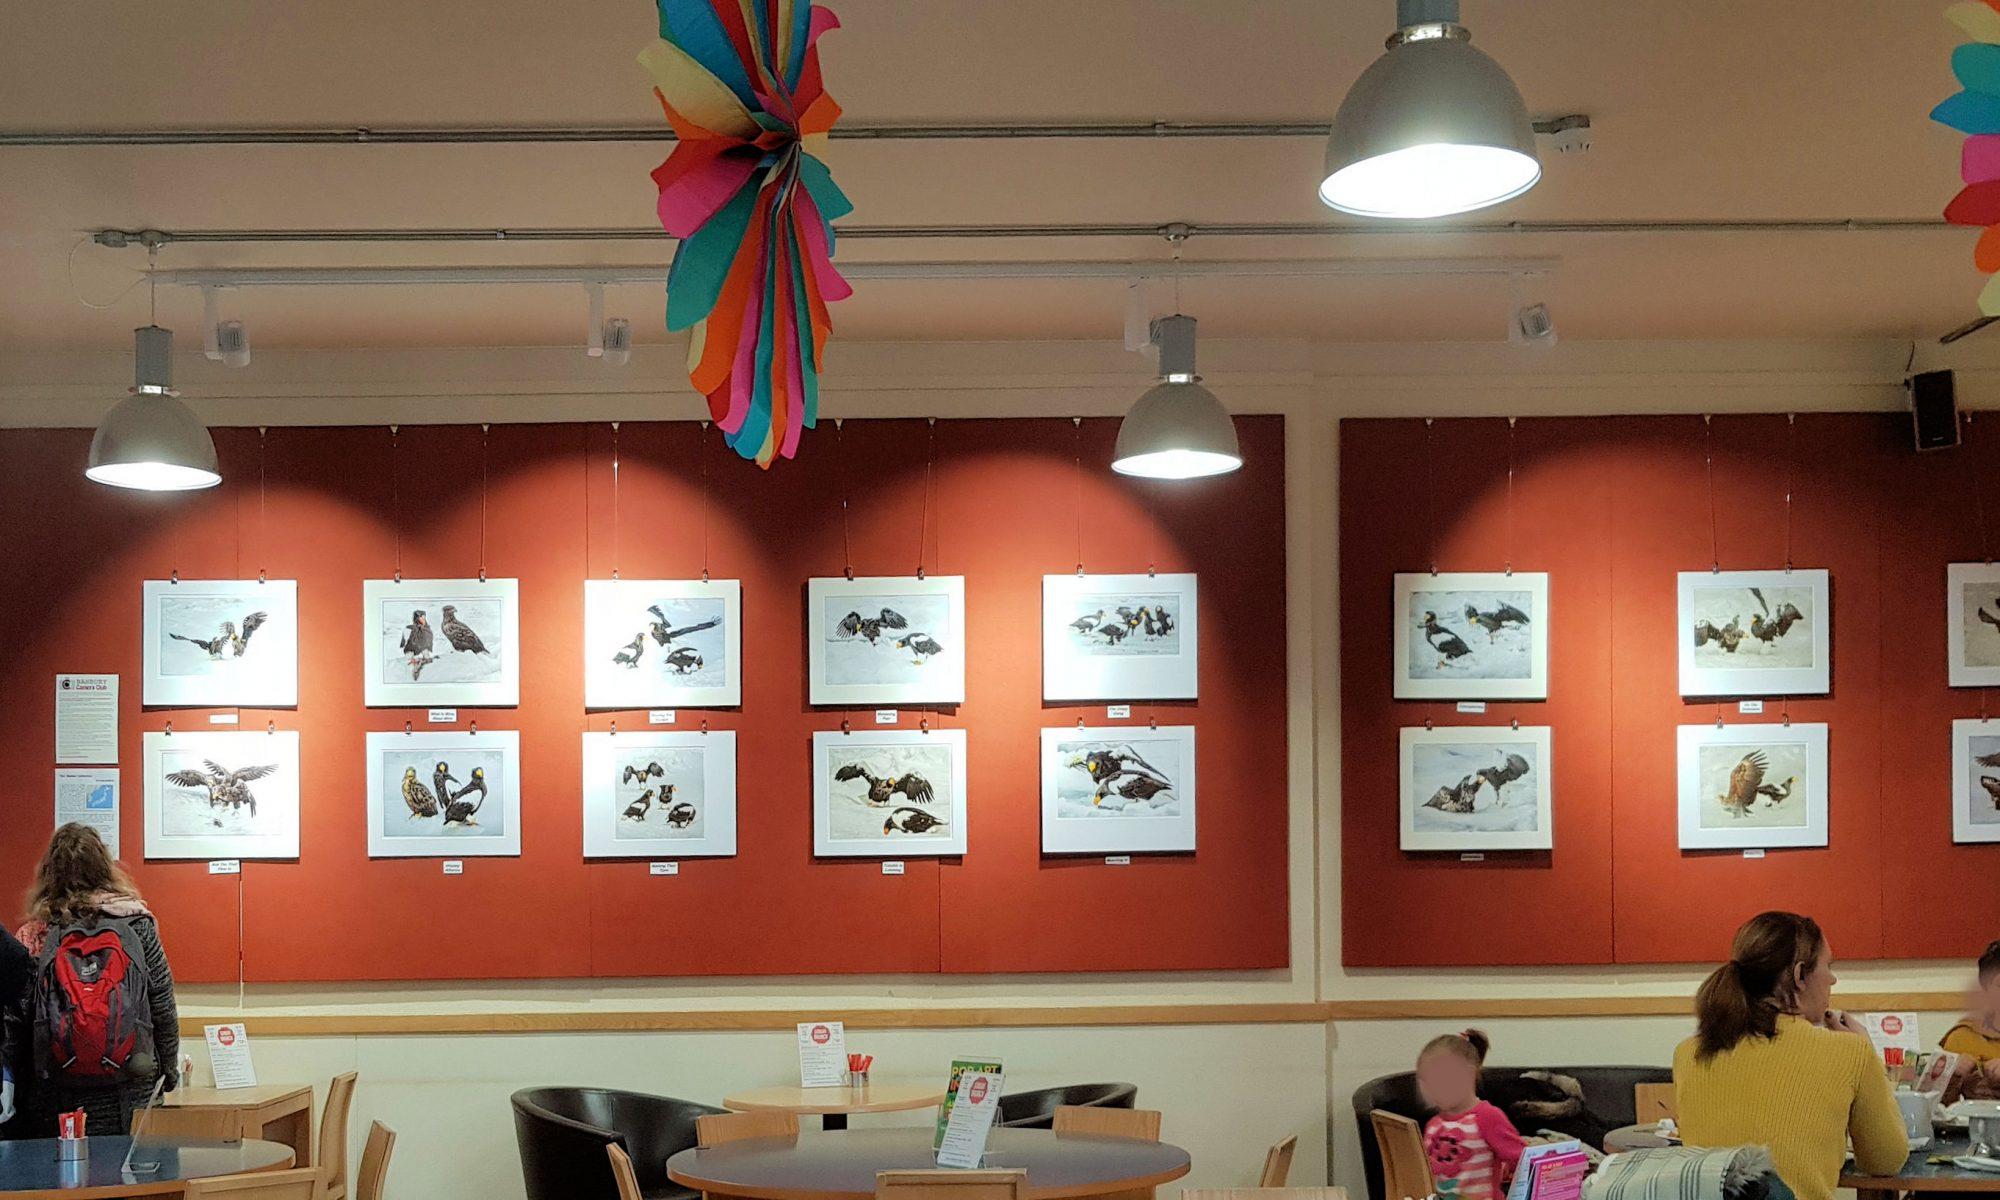 Chris Baldwin's exhibition